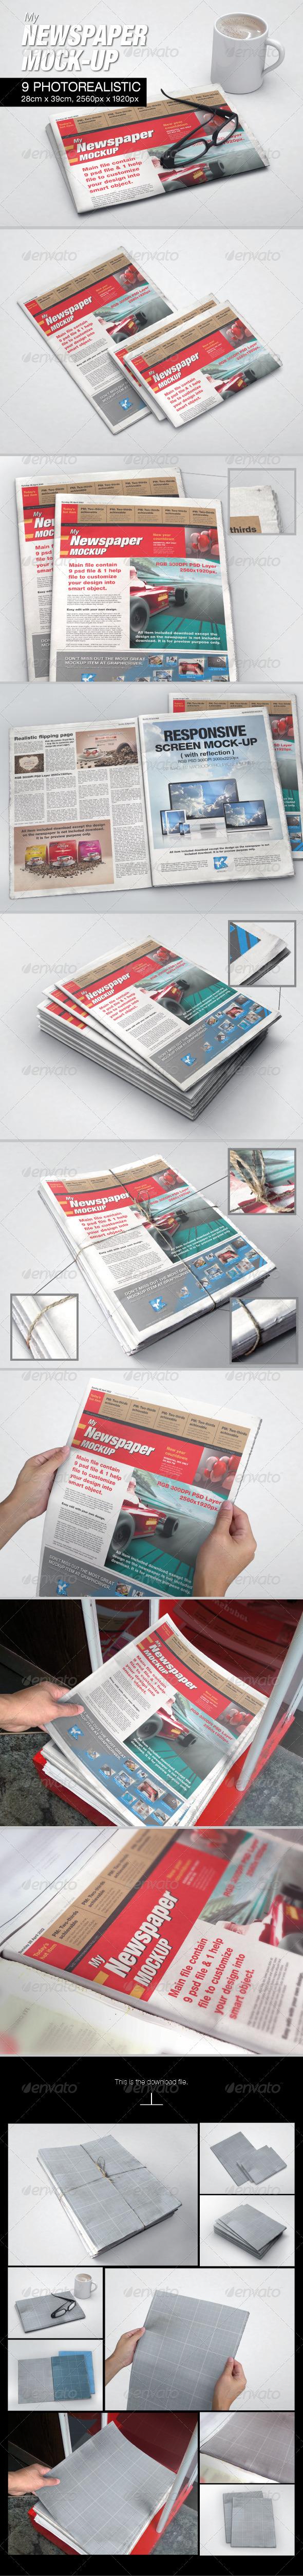 GraphicRiver MyNewspaper Mock-up 6533964